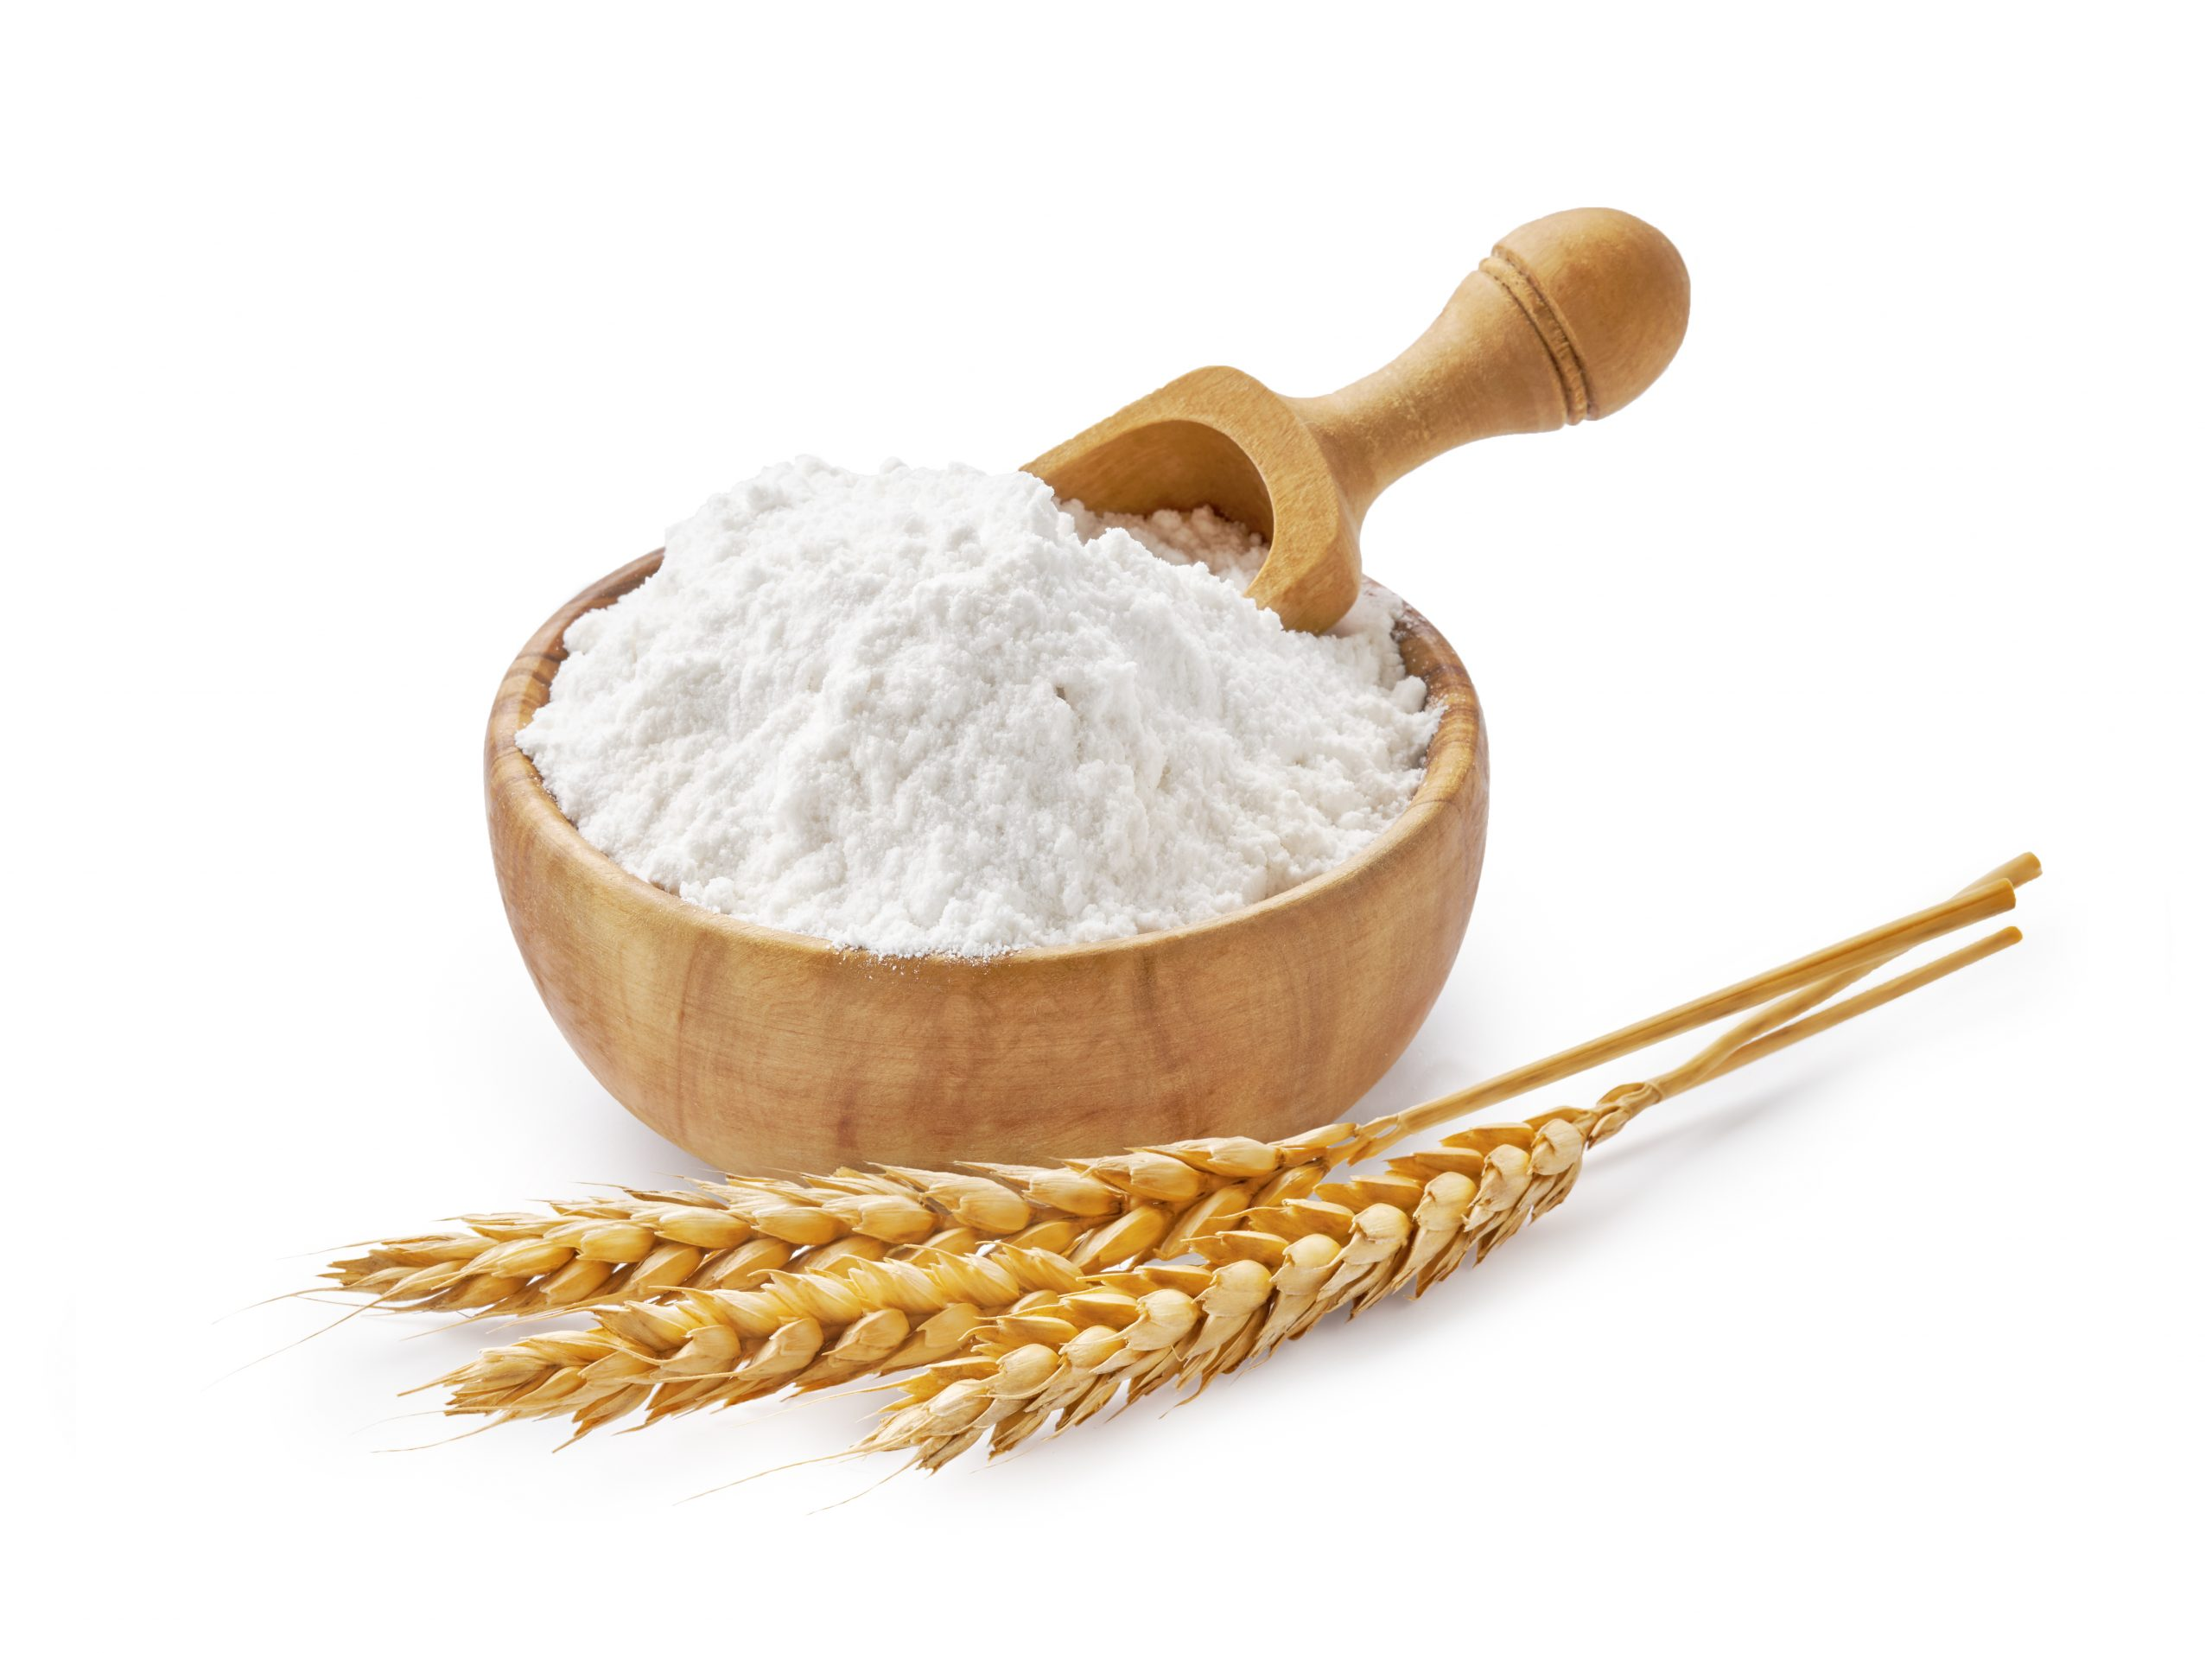 Folic acid to be added to flour